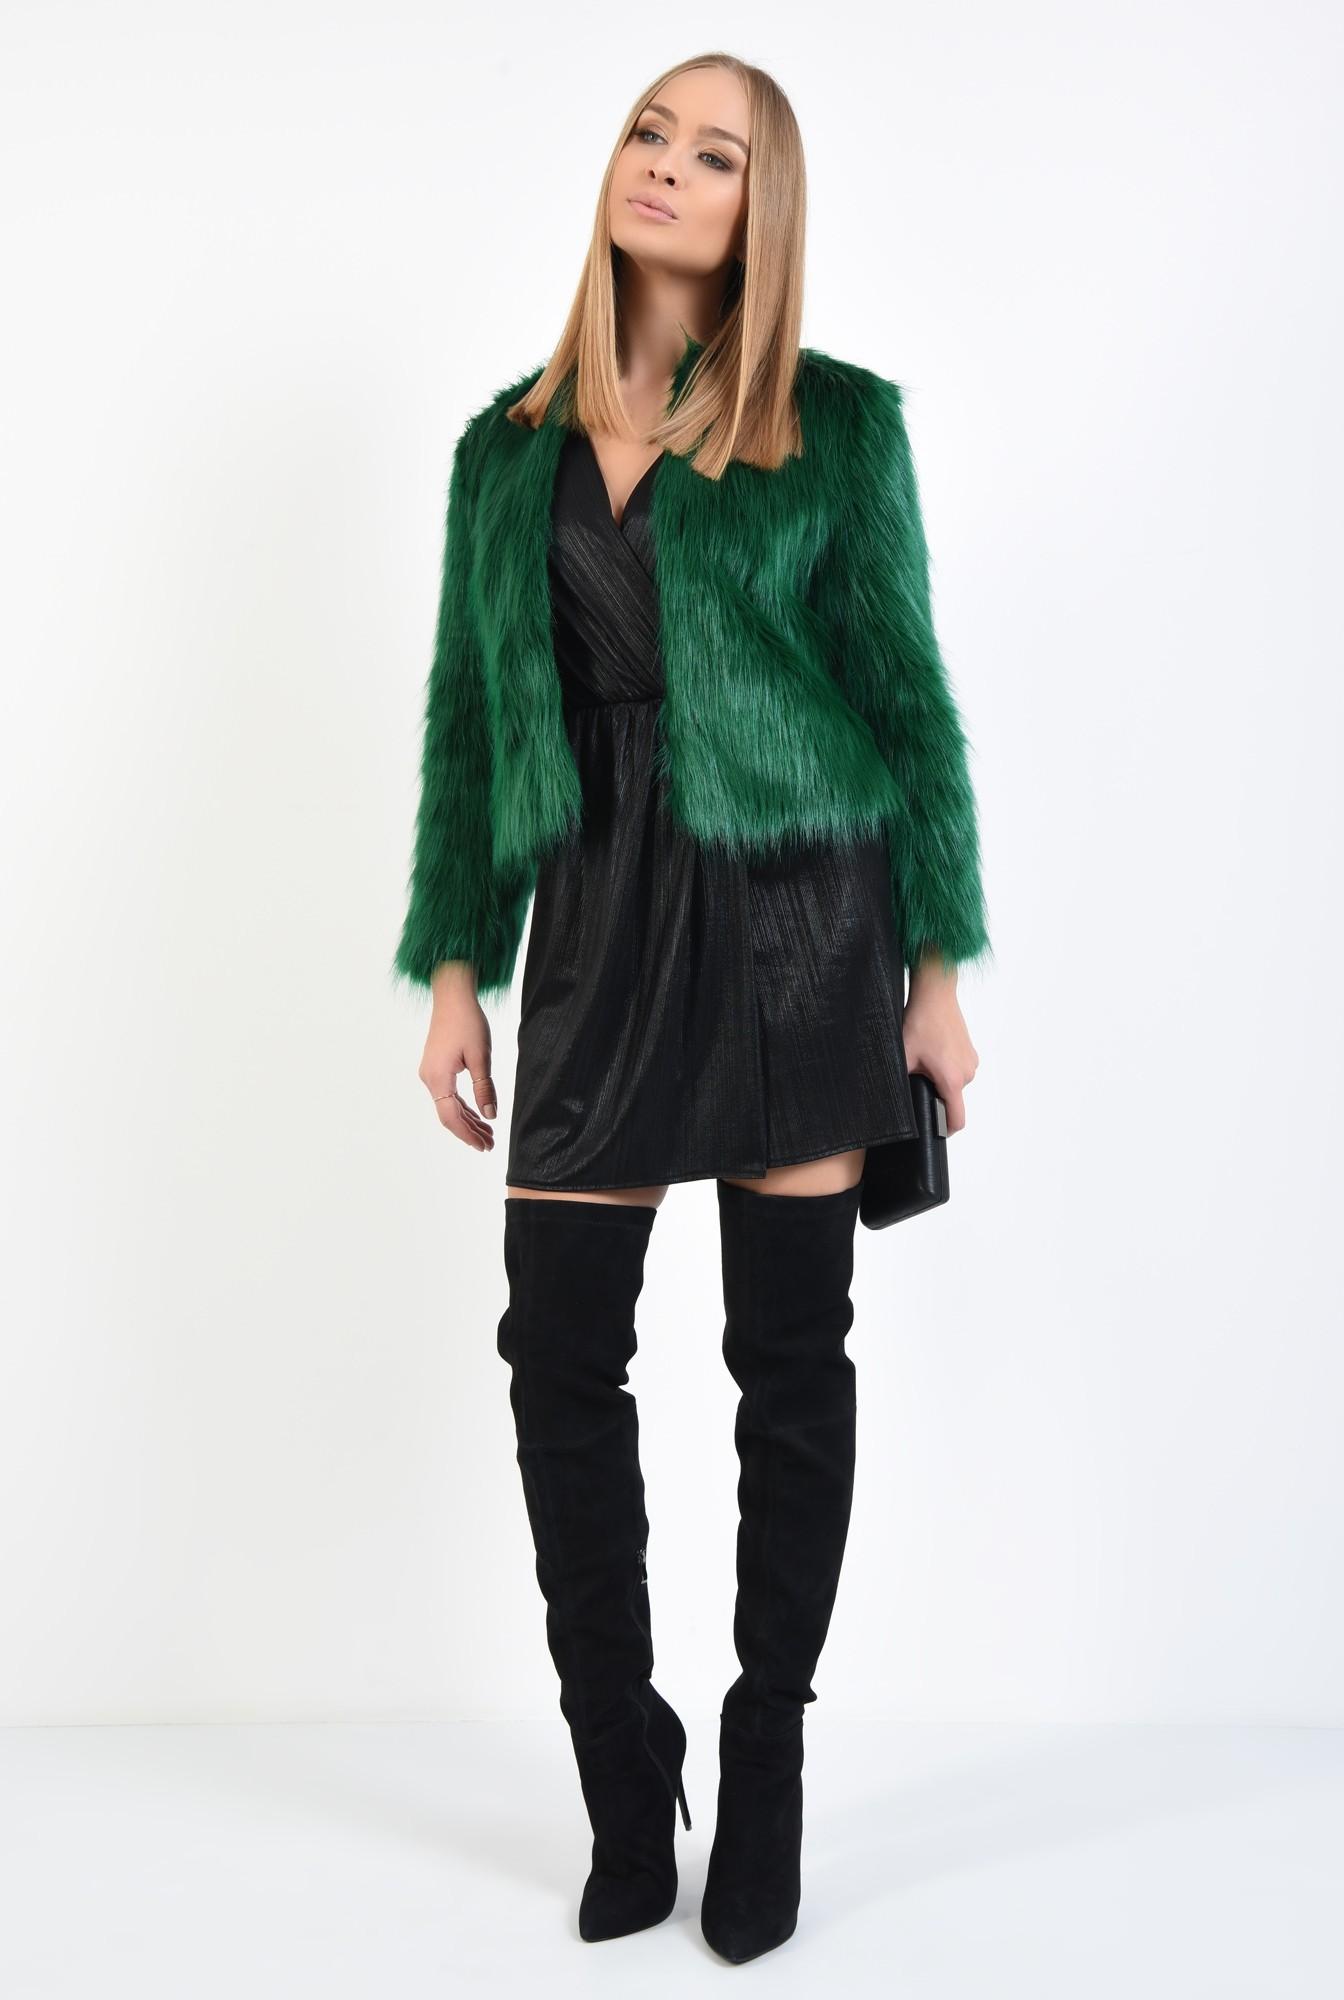 3 - jacheta verde, blana artificiala, maneci lungi